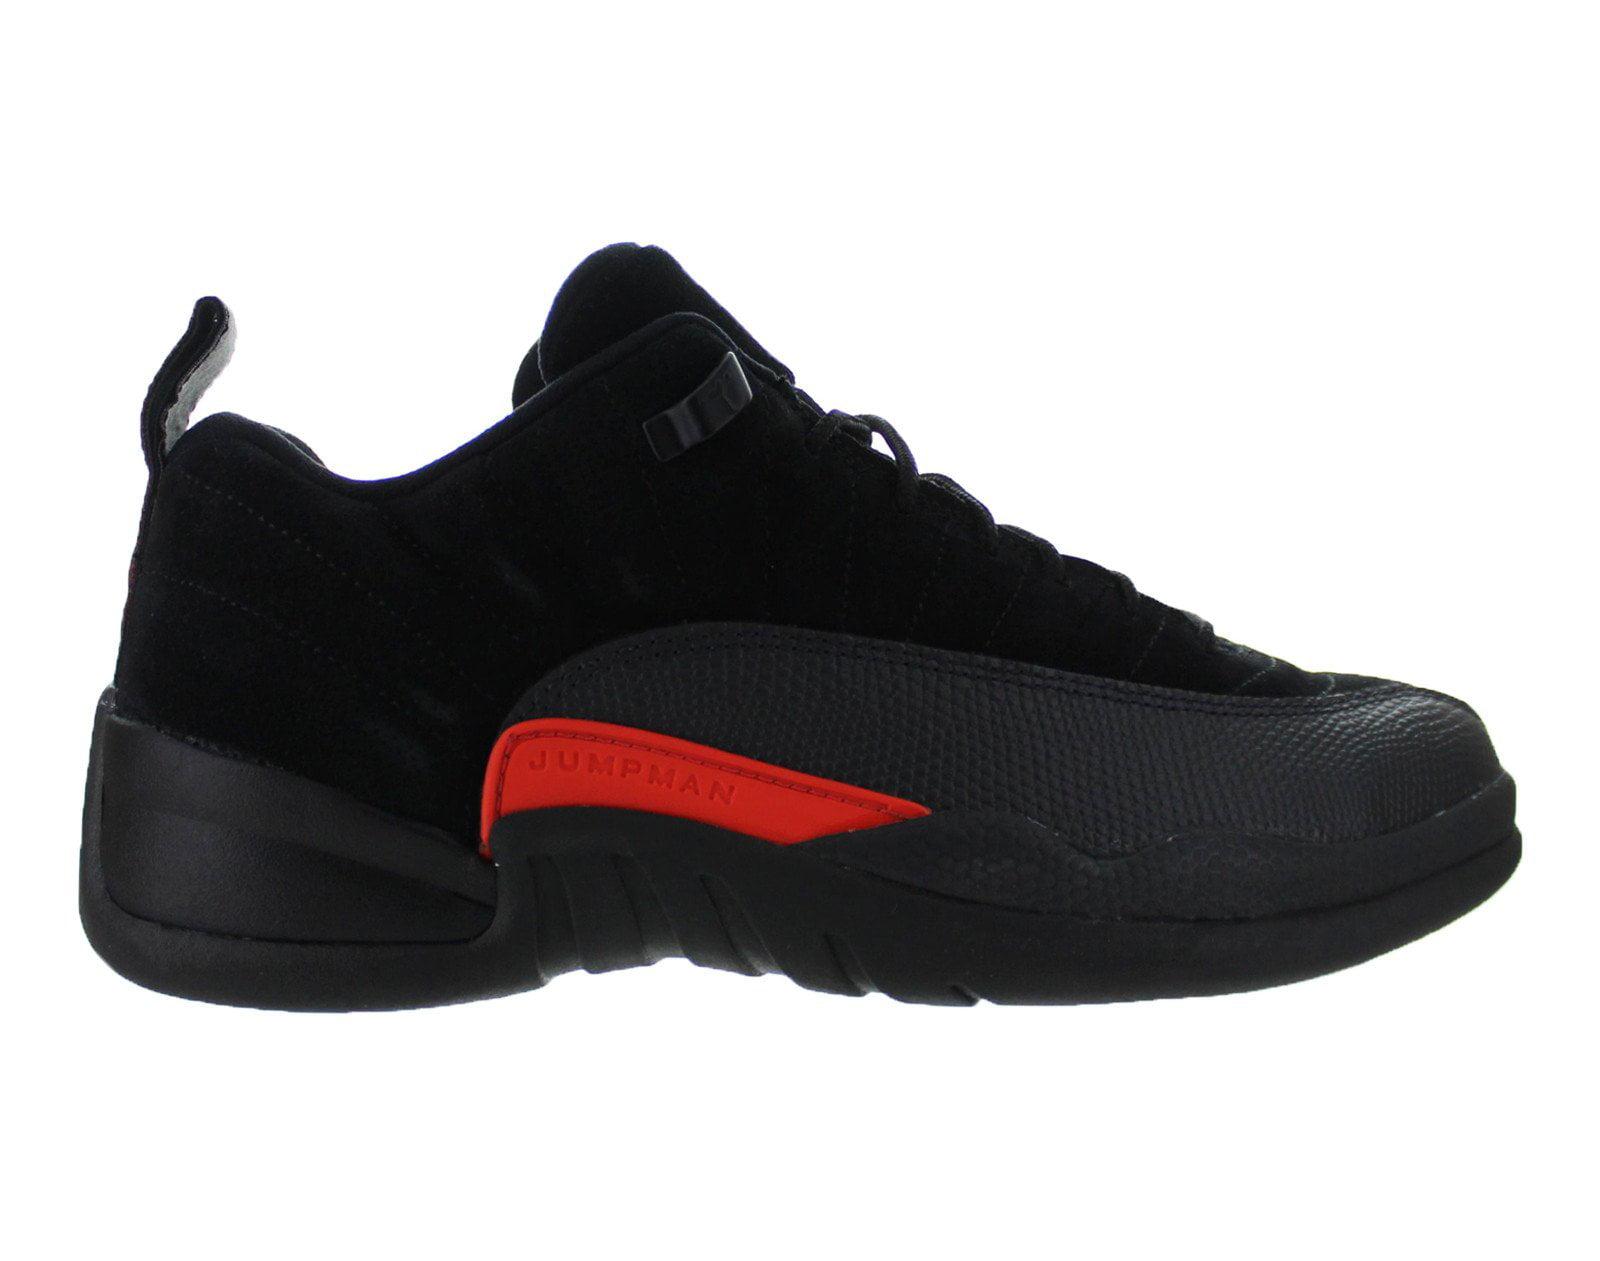 40b36688bcc9e1 Jordan - Kids Air Jordan 12 XII Retro Low GS Max Orange Black Anthracite  308305 - Walmart.com